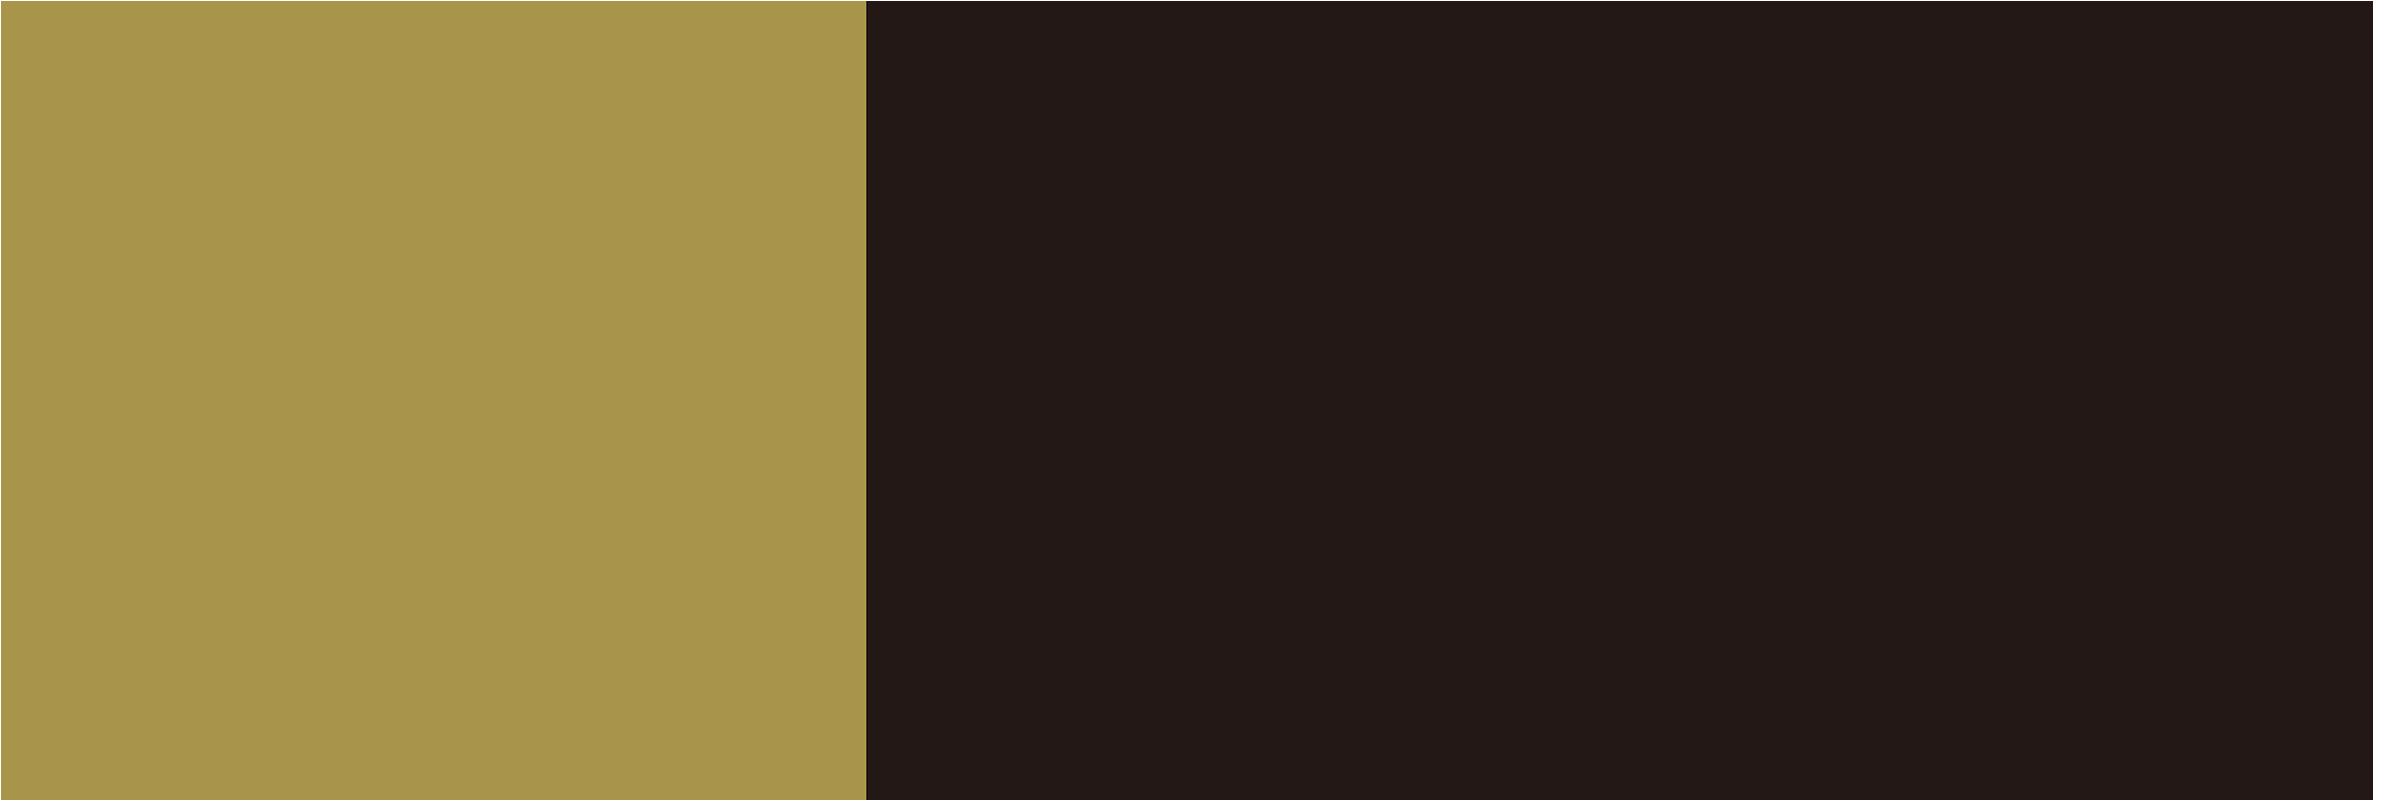 BHY(痩身・美顔・エイジングケア・美容整体)